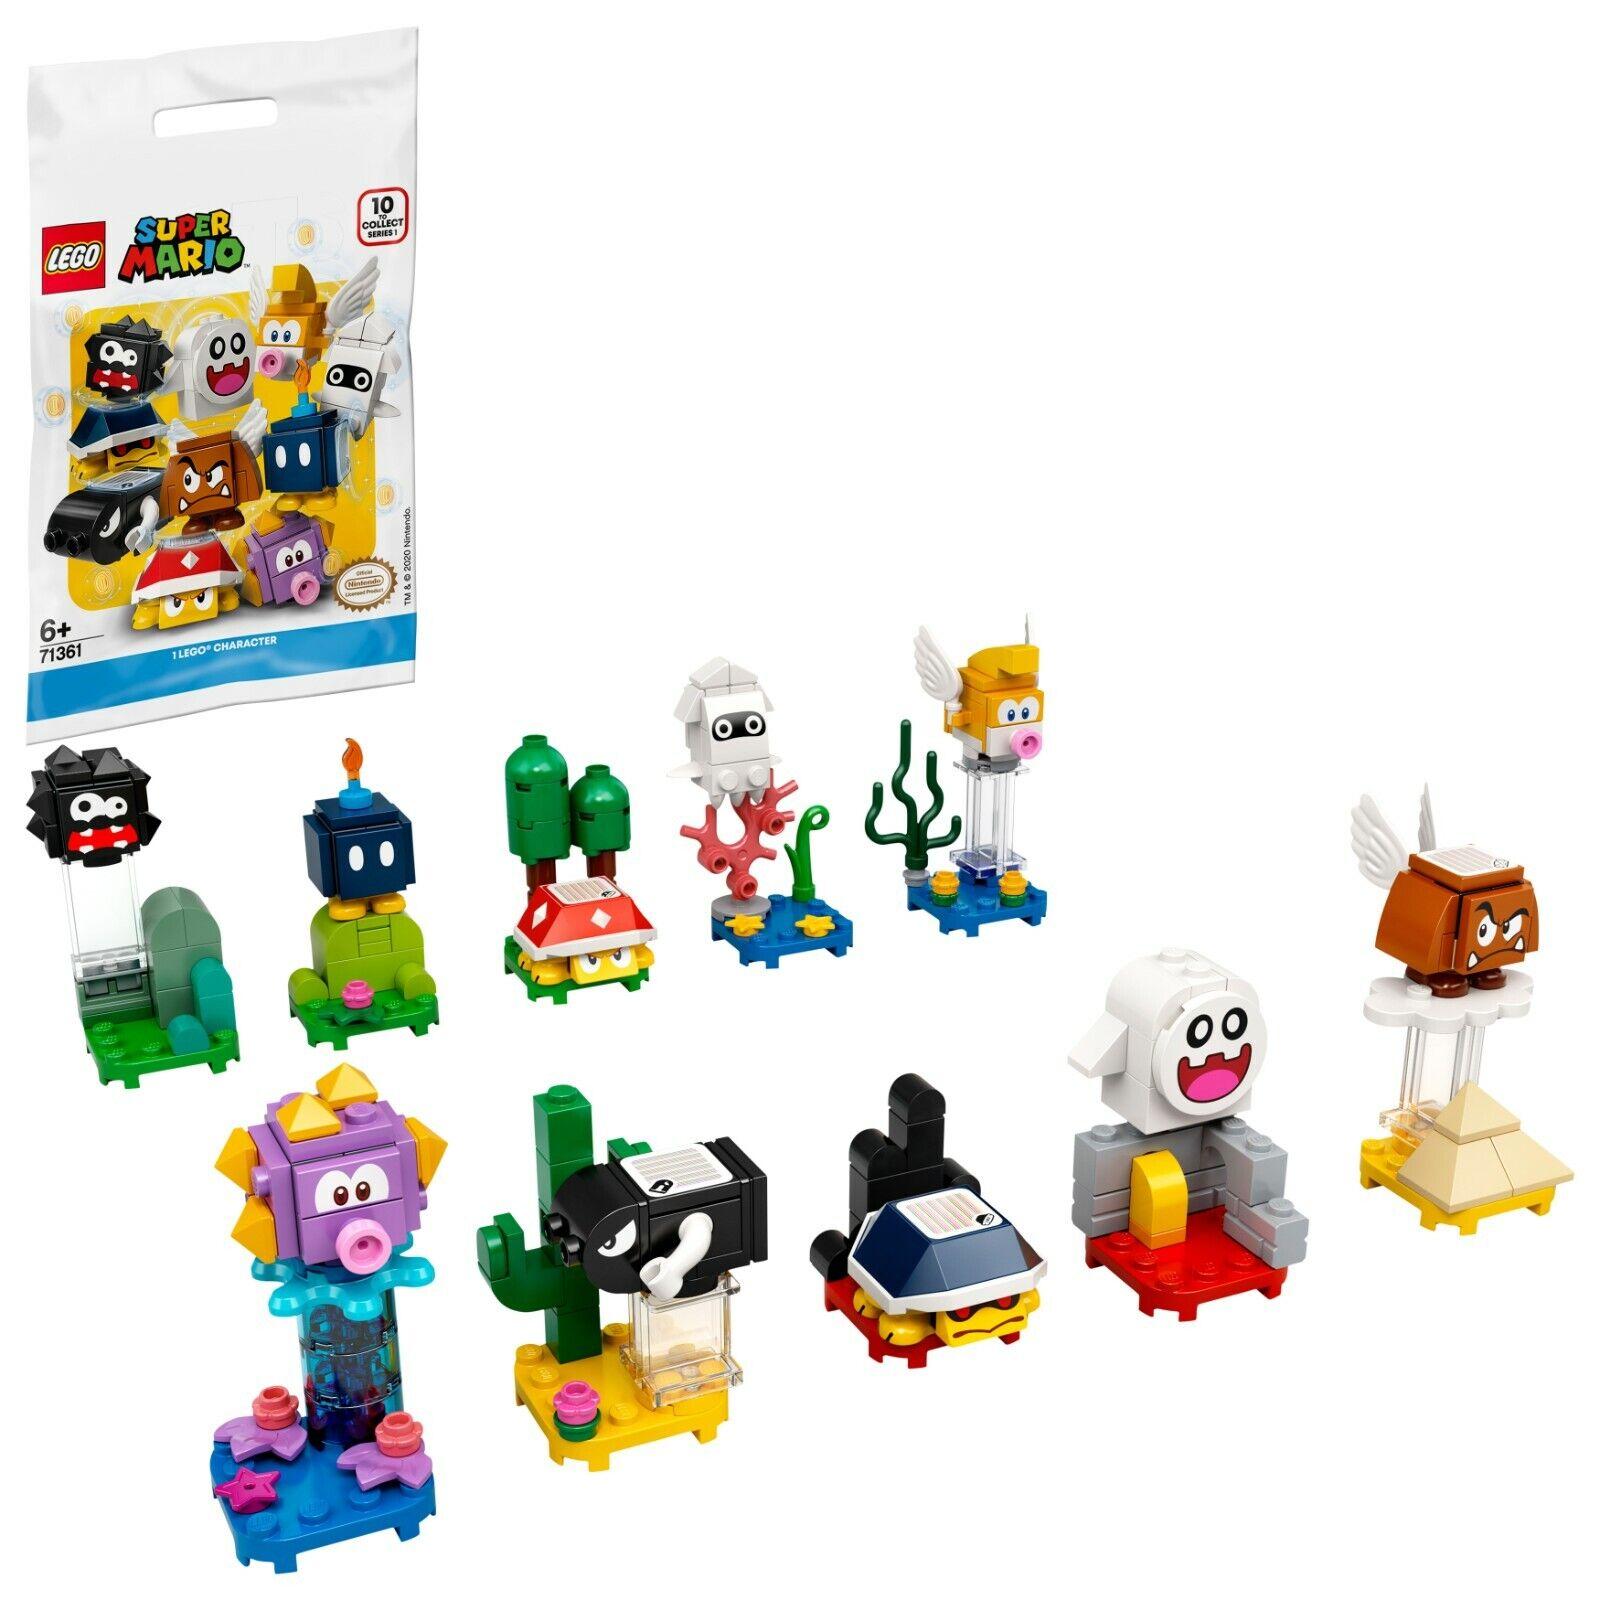 LEGO® 71361 Mario-Charaktere-Serie - freie Auswahl / alle 10 Sets - NEU in OVP